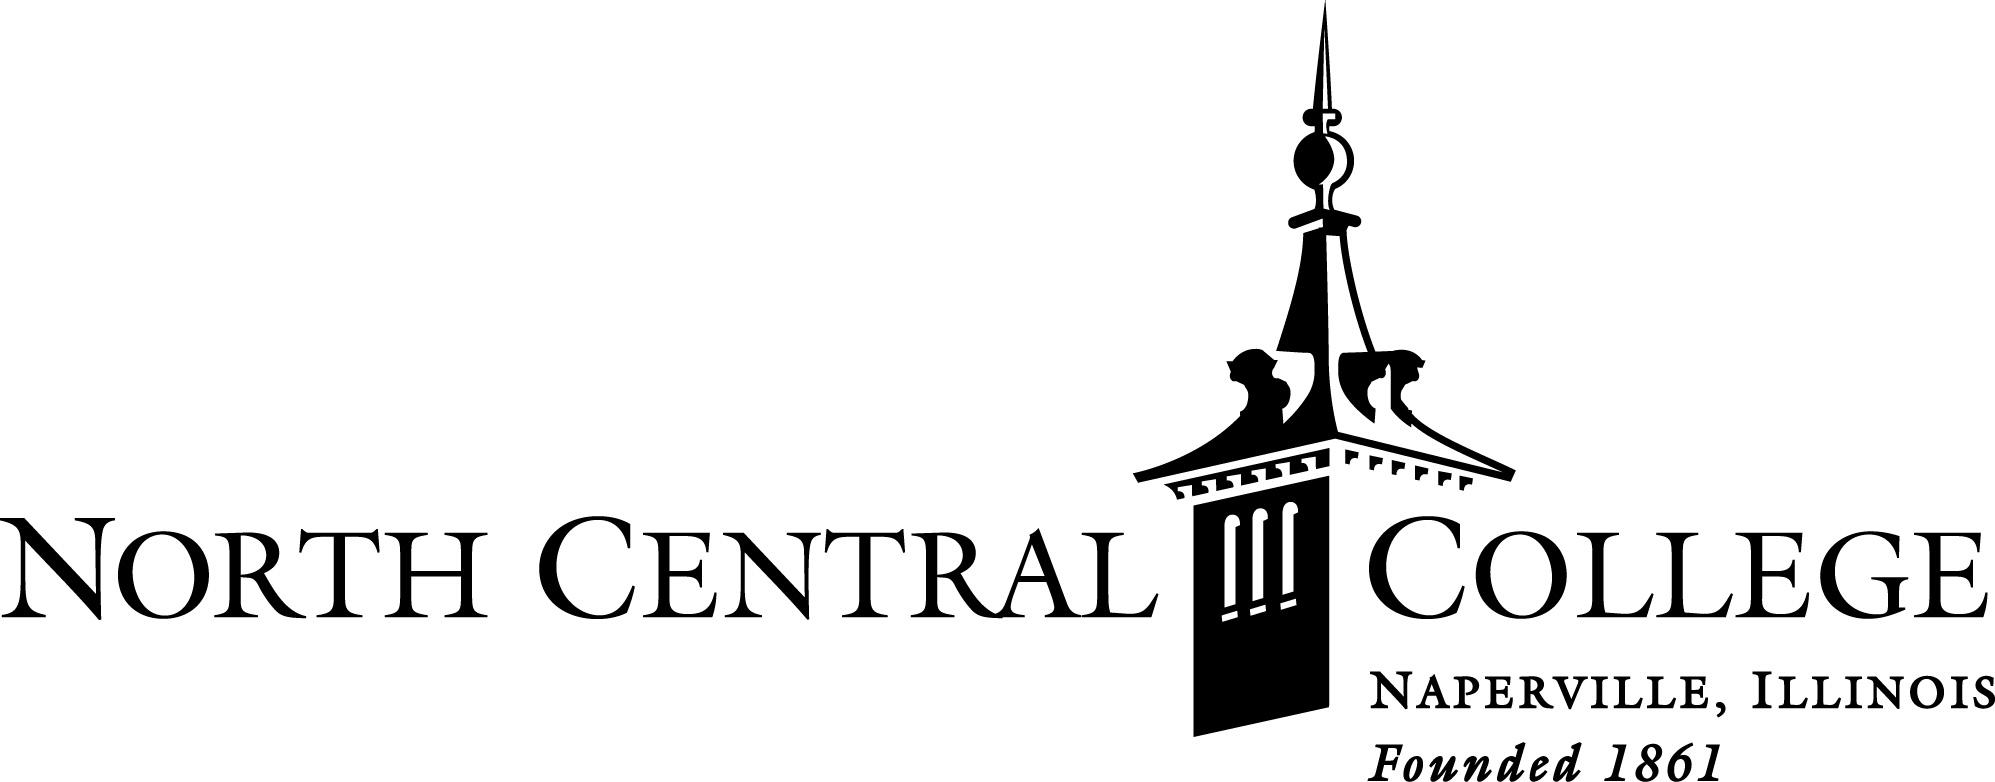 North Central College ELI ノースセントラルカレッジ付属語学講習プログラム